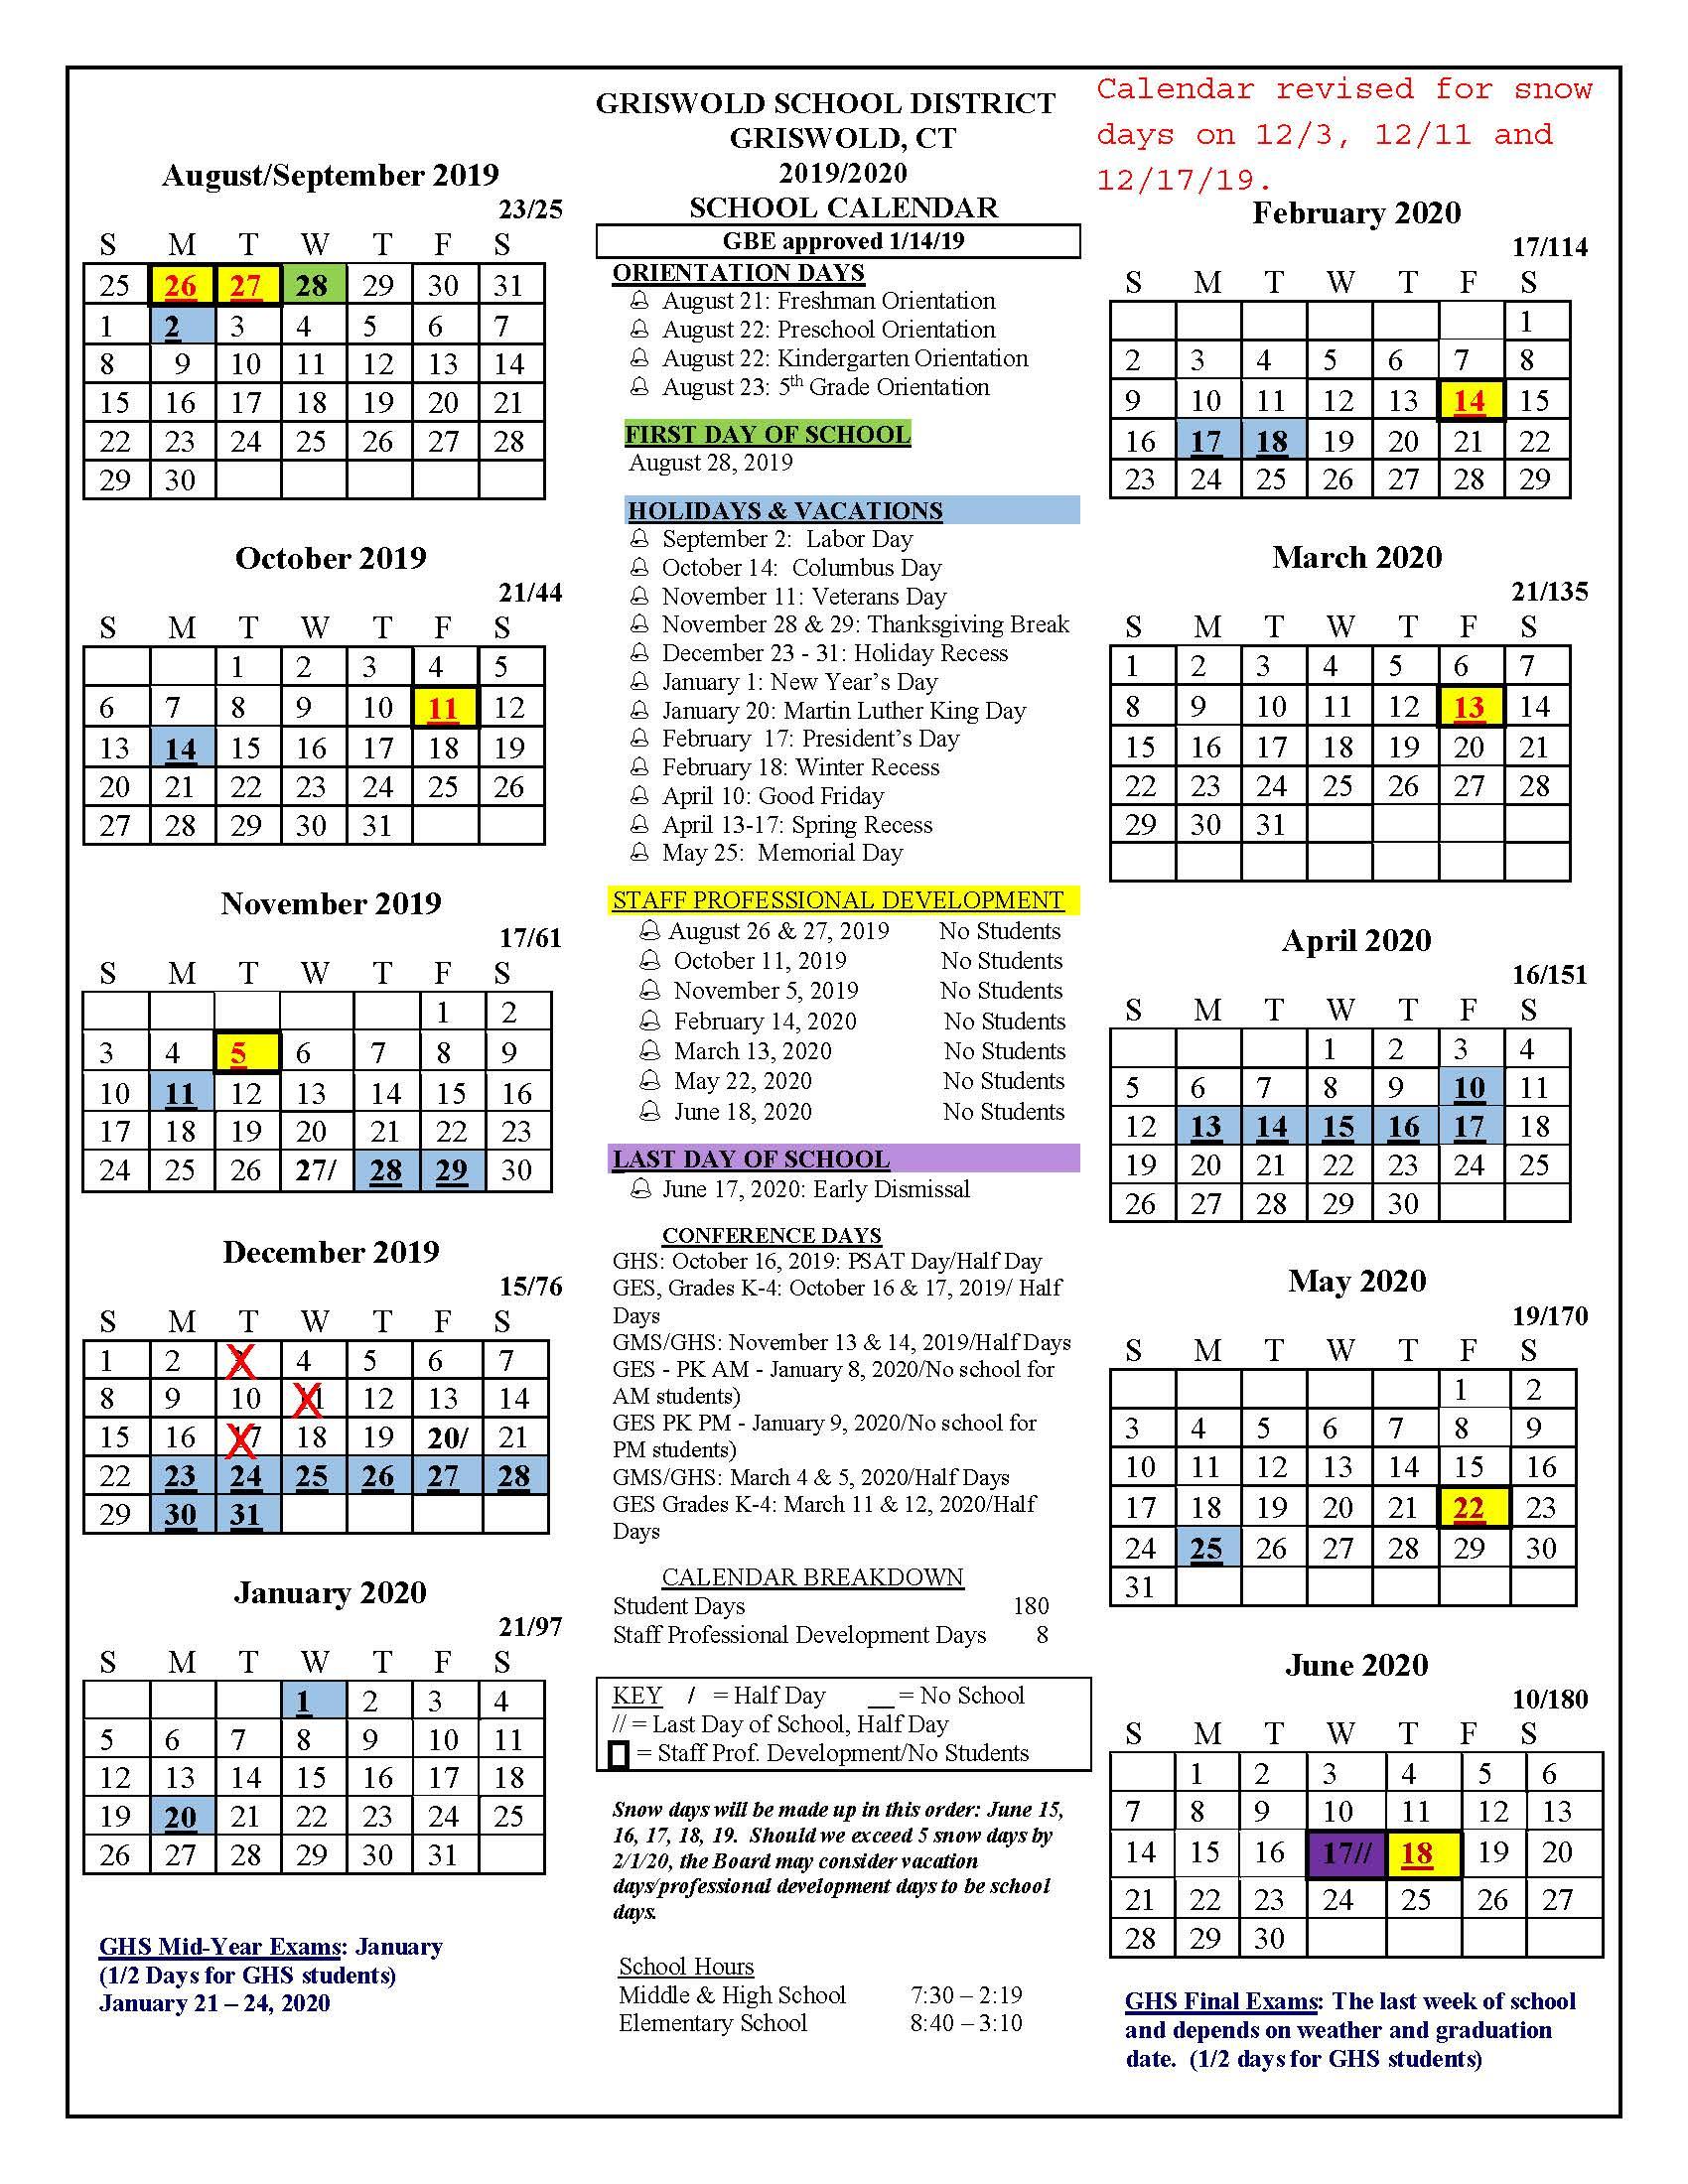 Board Approved Academic Calendar - Griswold Public Schools Inside Naugatuck Valley Community College Calendar